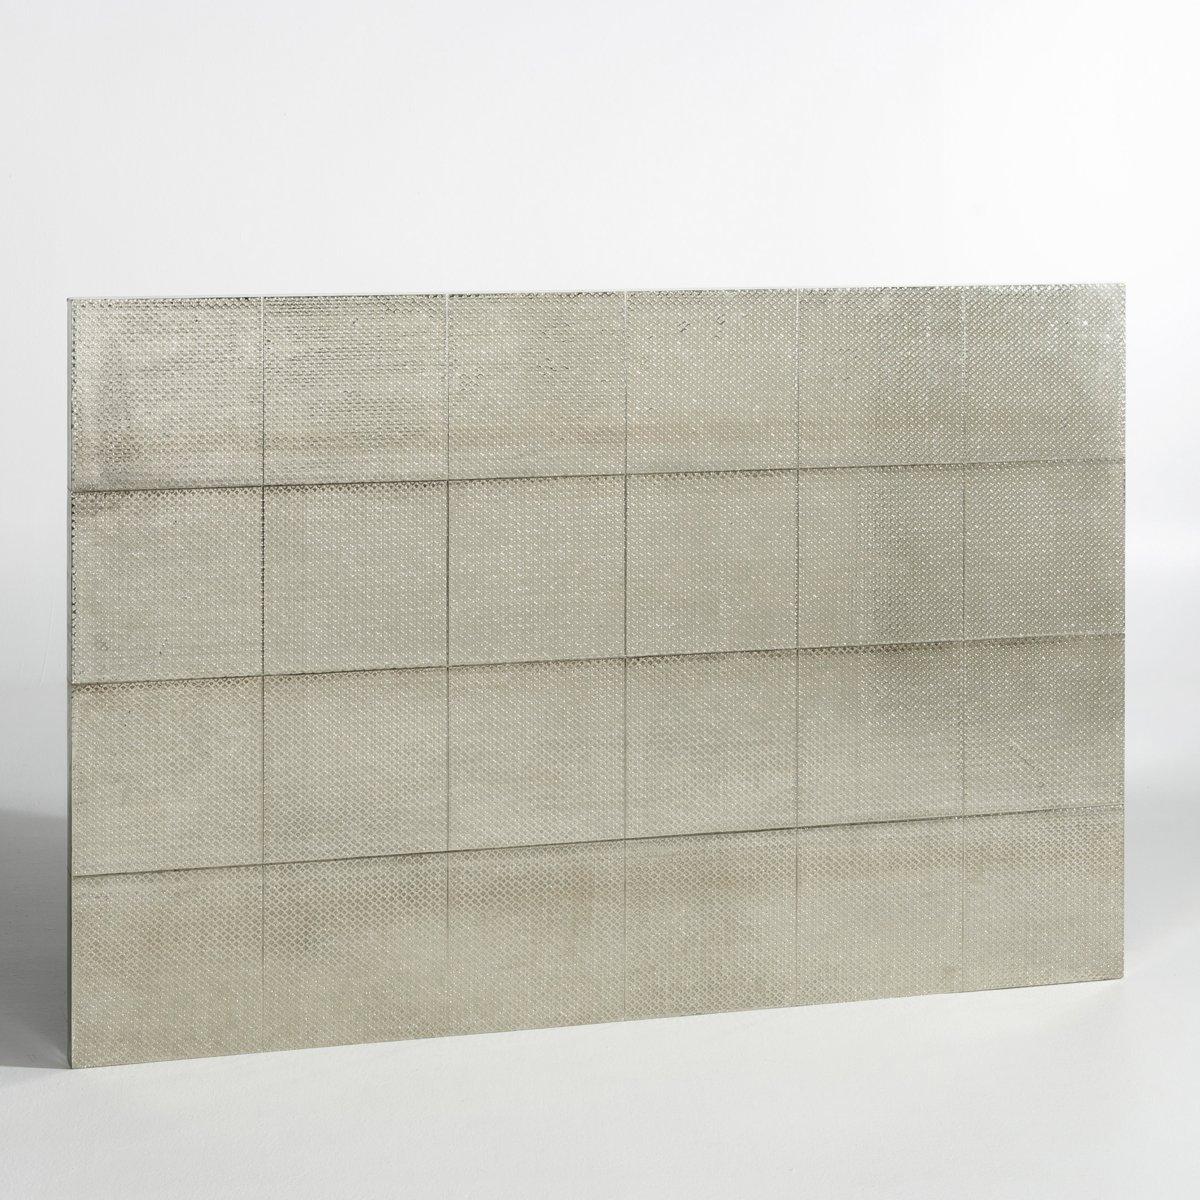 "Kopfteil \""Luba\"", gehämmertes Metall, H. 120 cm"